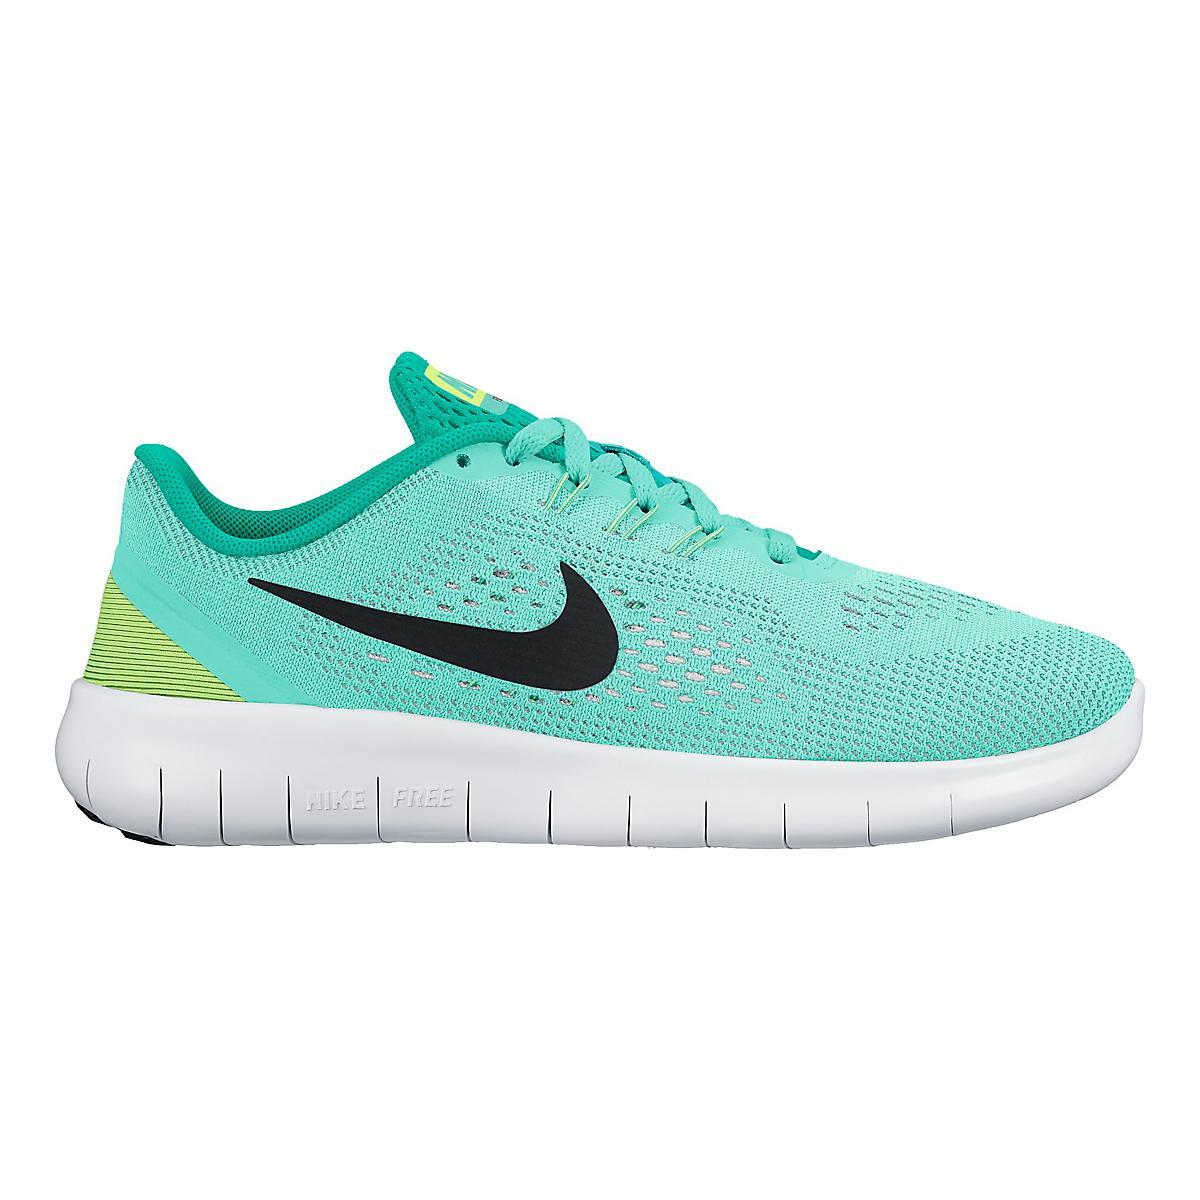 f24c4620e33d Kids Nike Free RN Running Shoe at Road Runner Sports